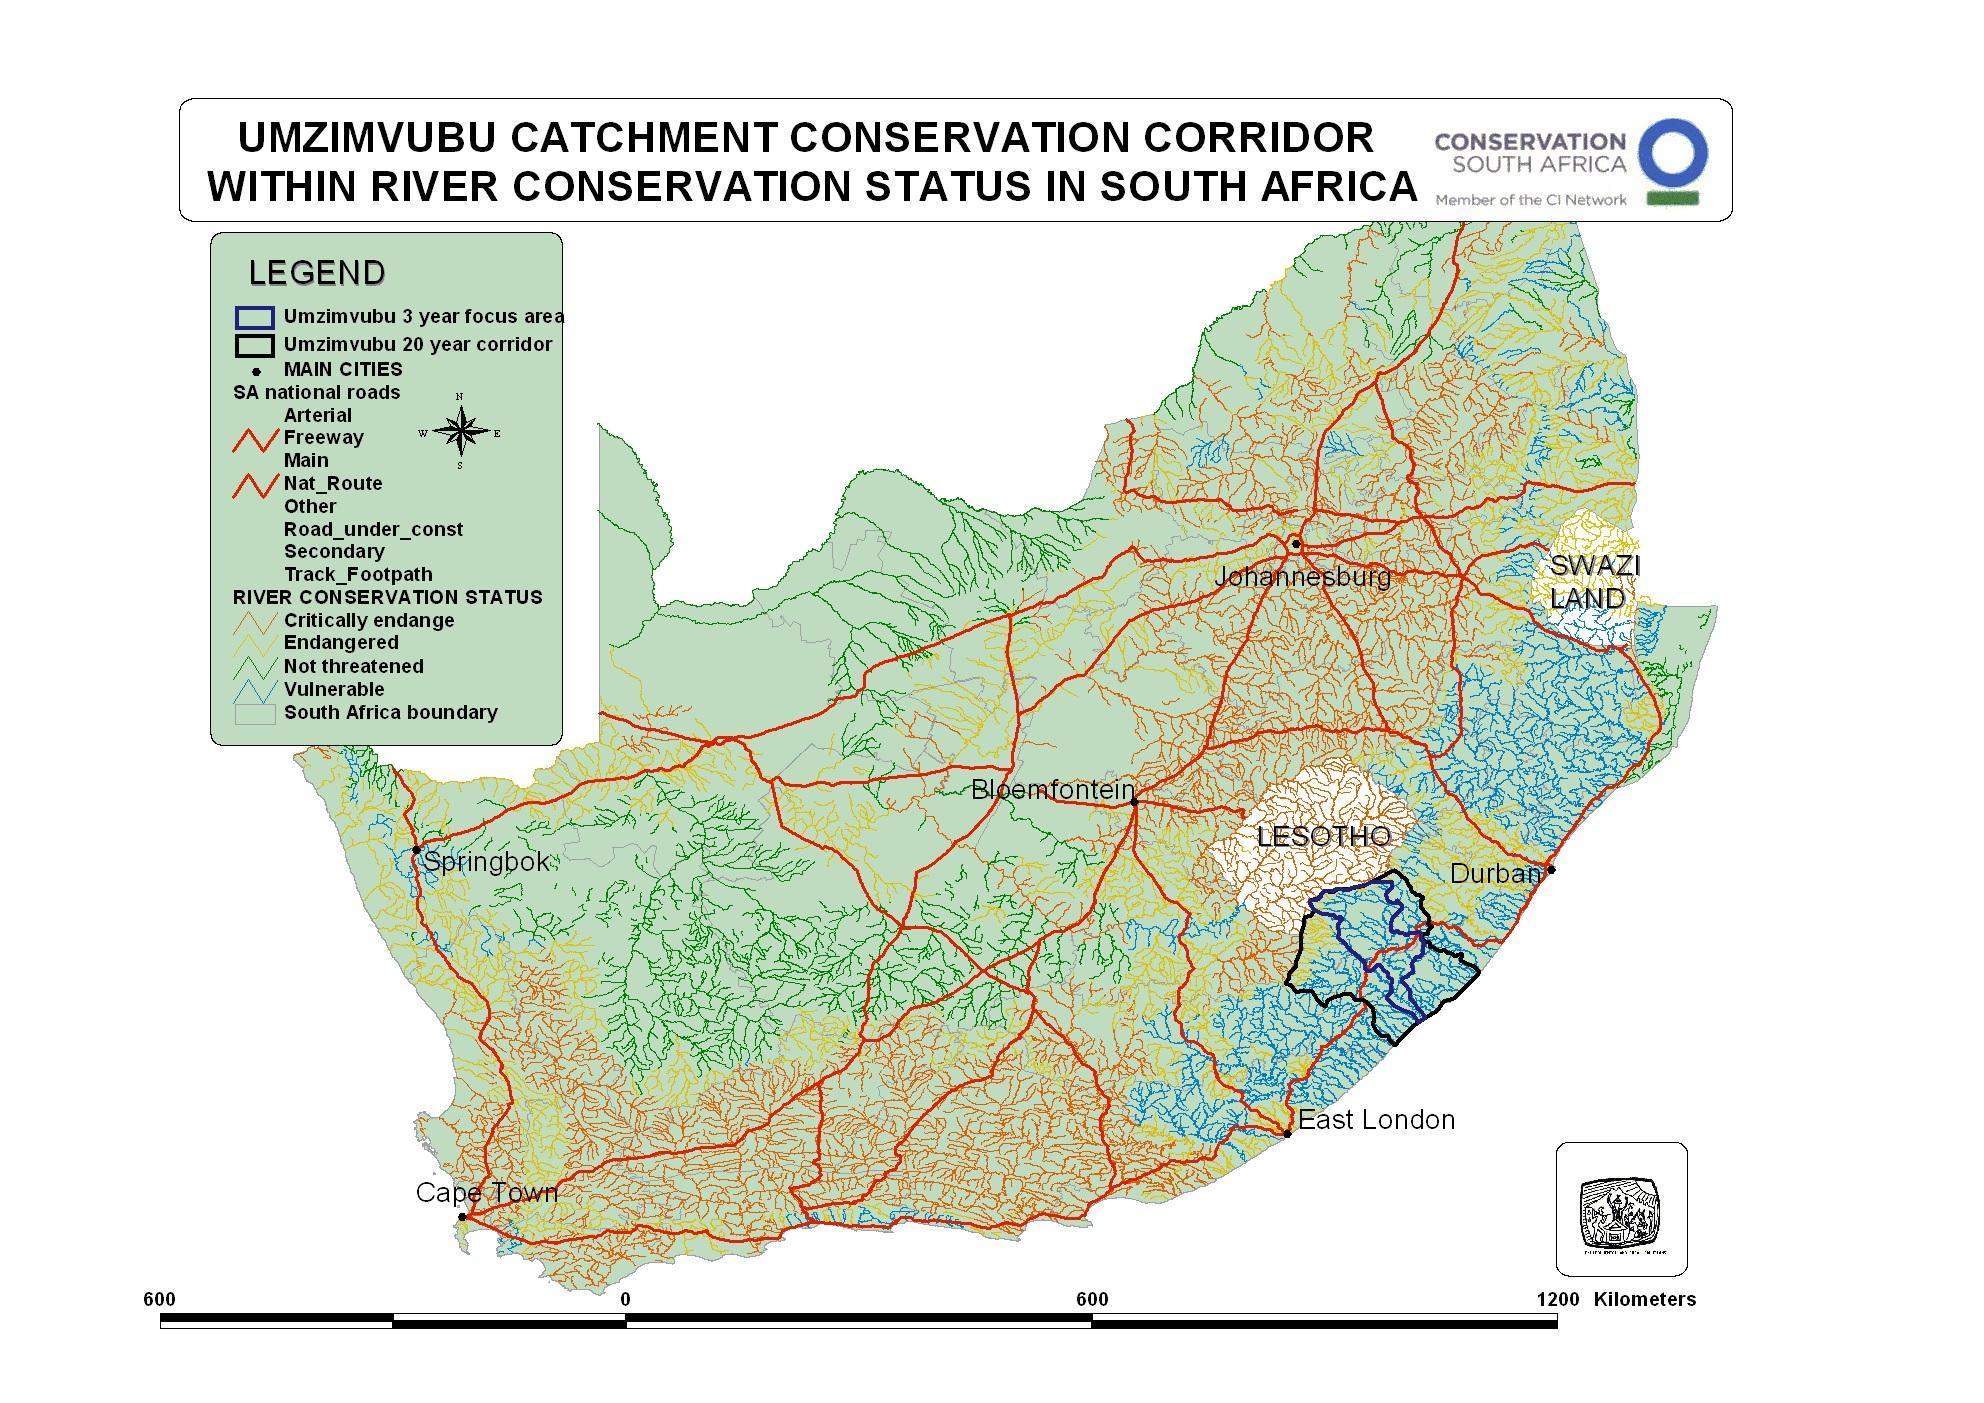 Umzimvubu Catchment Conservation Corridor